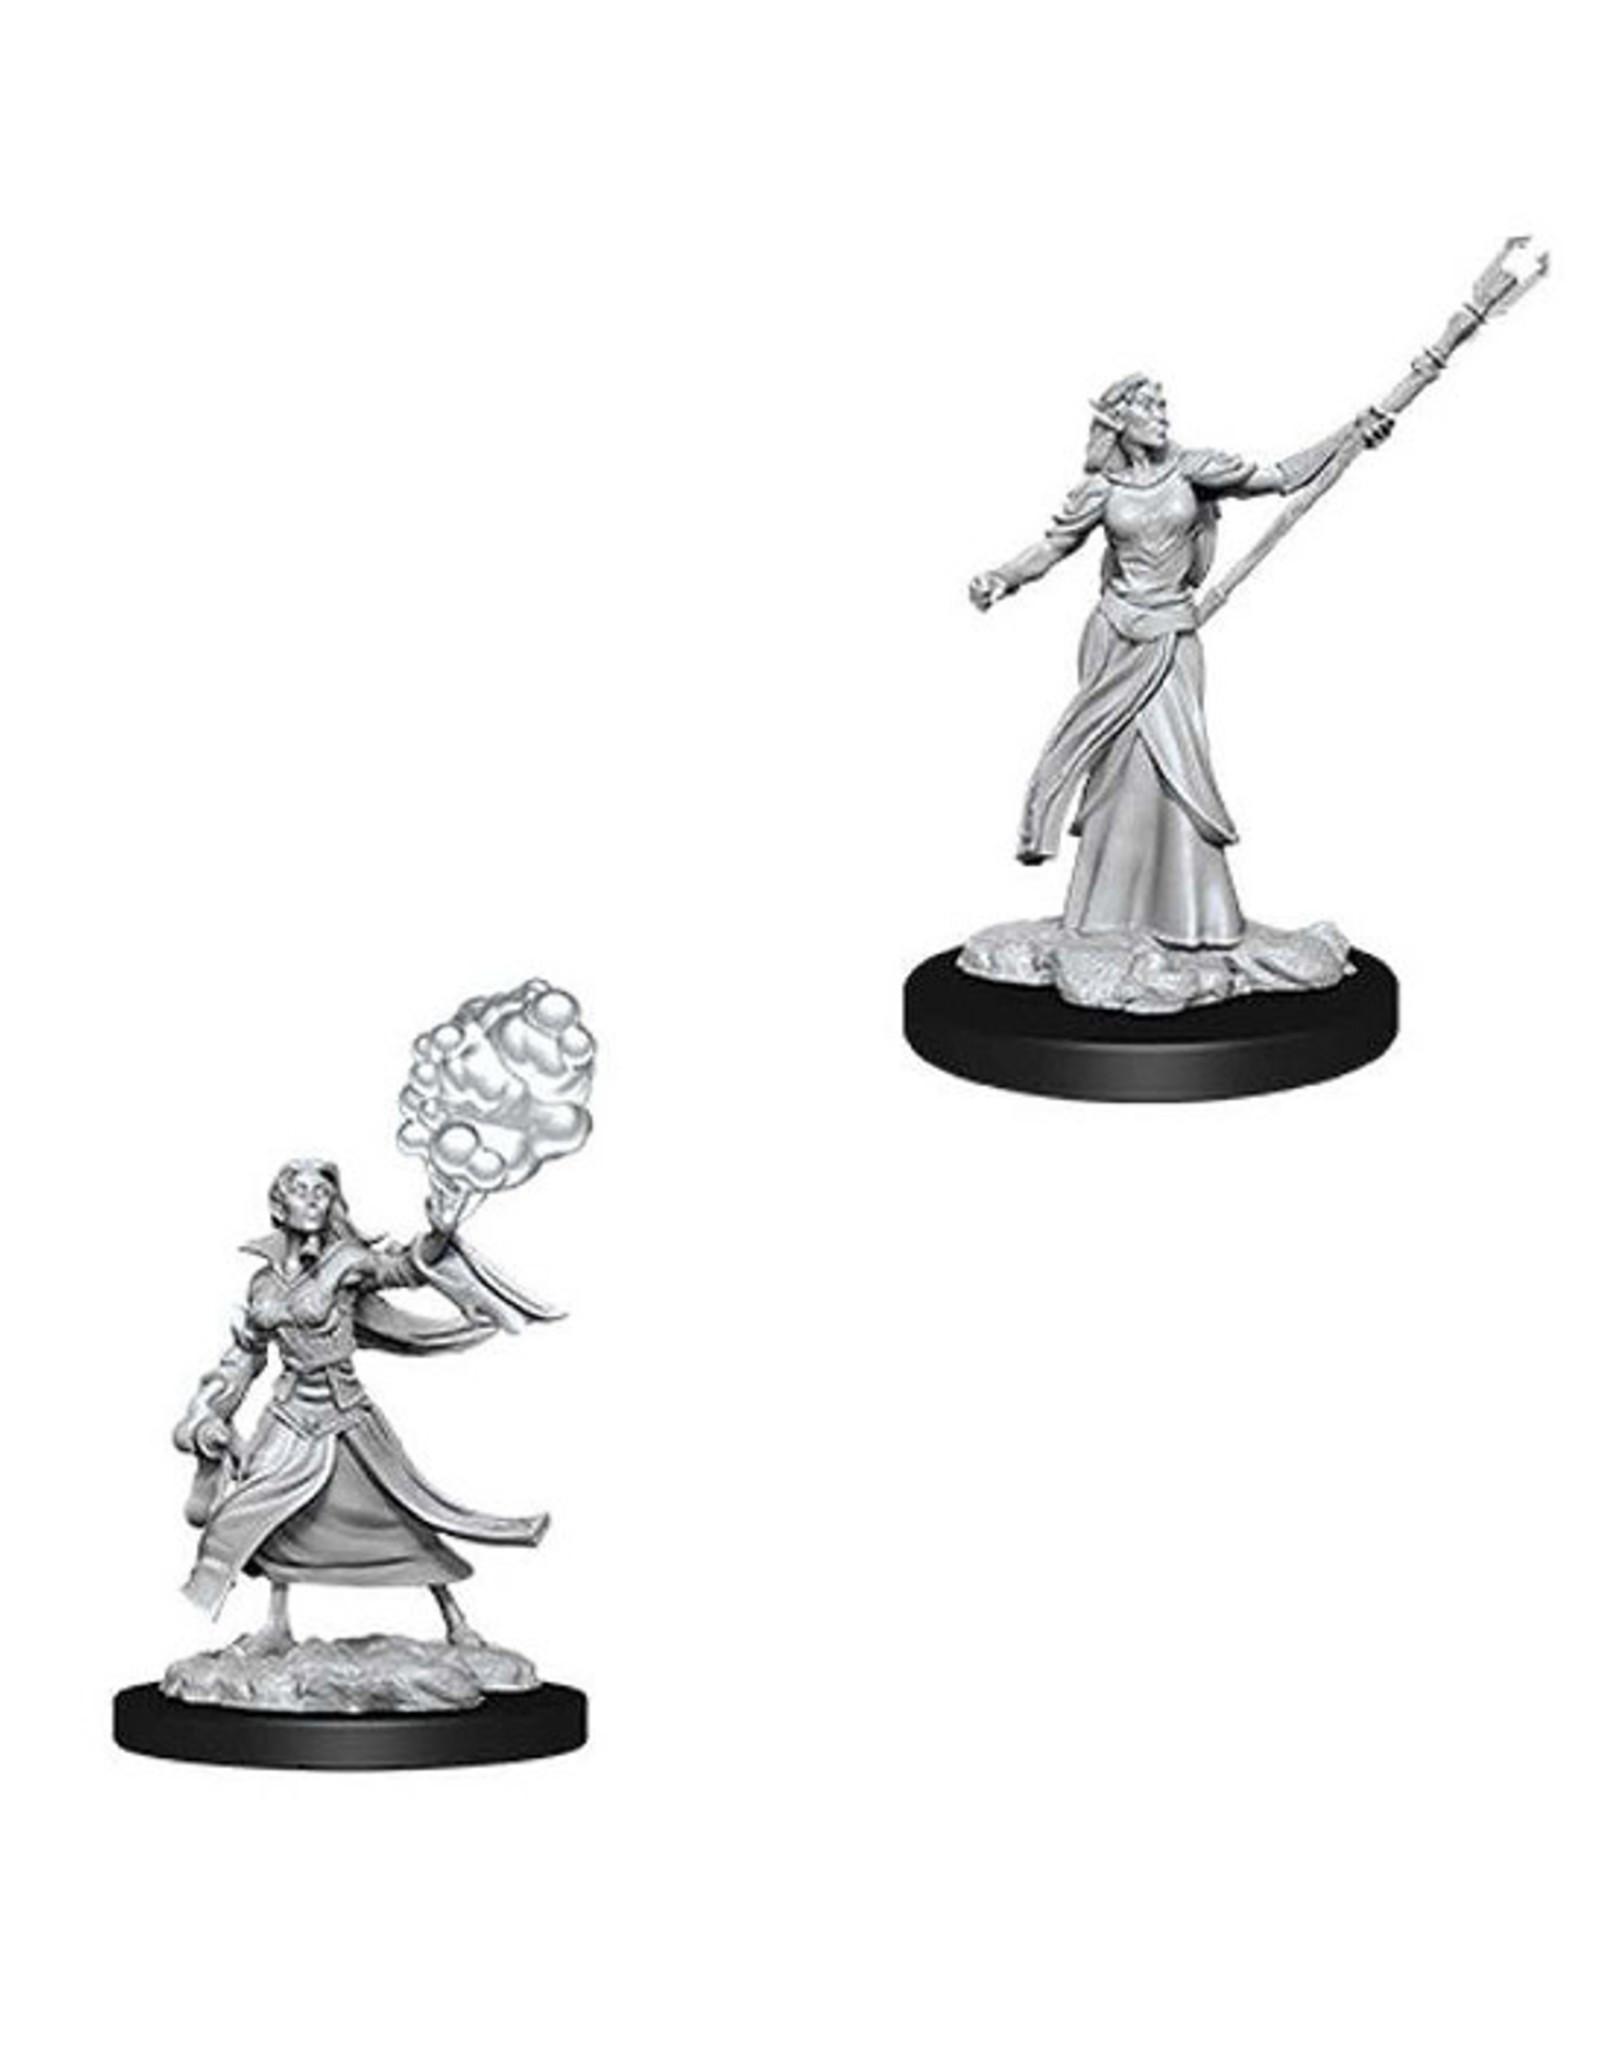 Dungeons & Dragons Dungeons & Dragons: Nolzur's - Elf Female Sorcerer